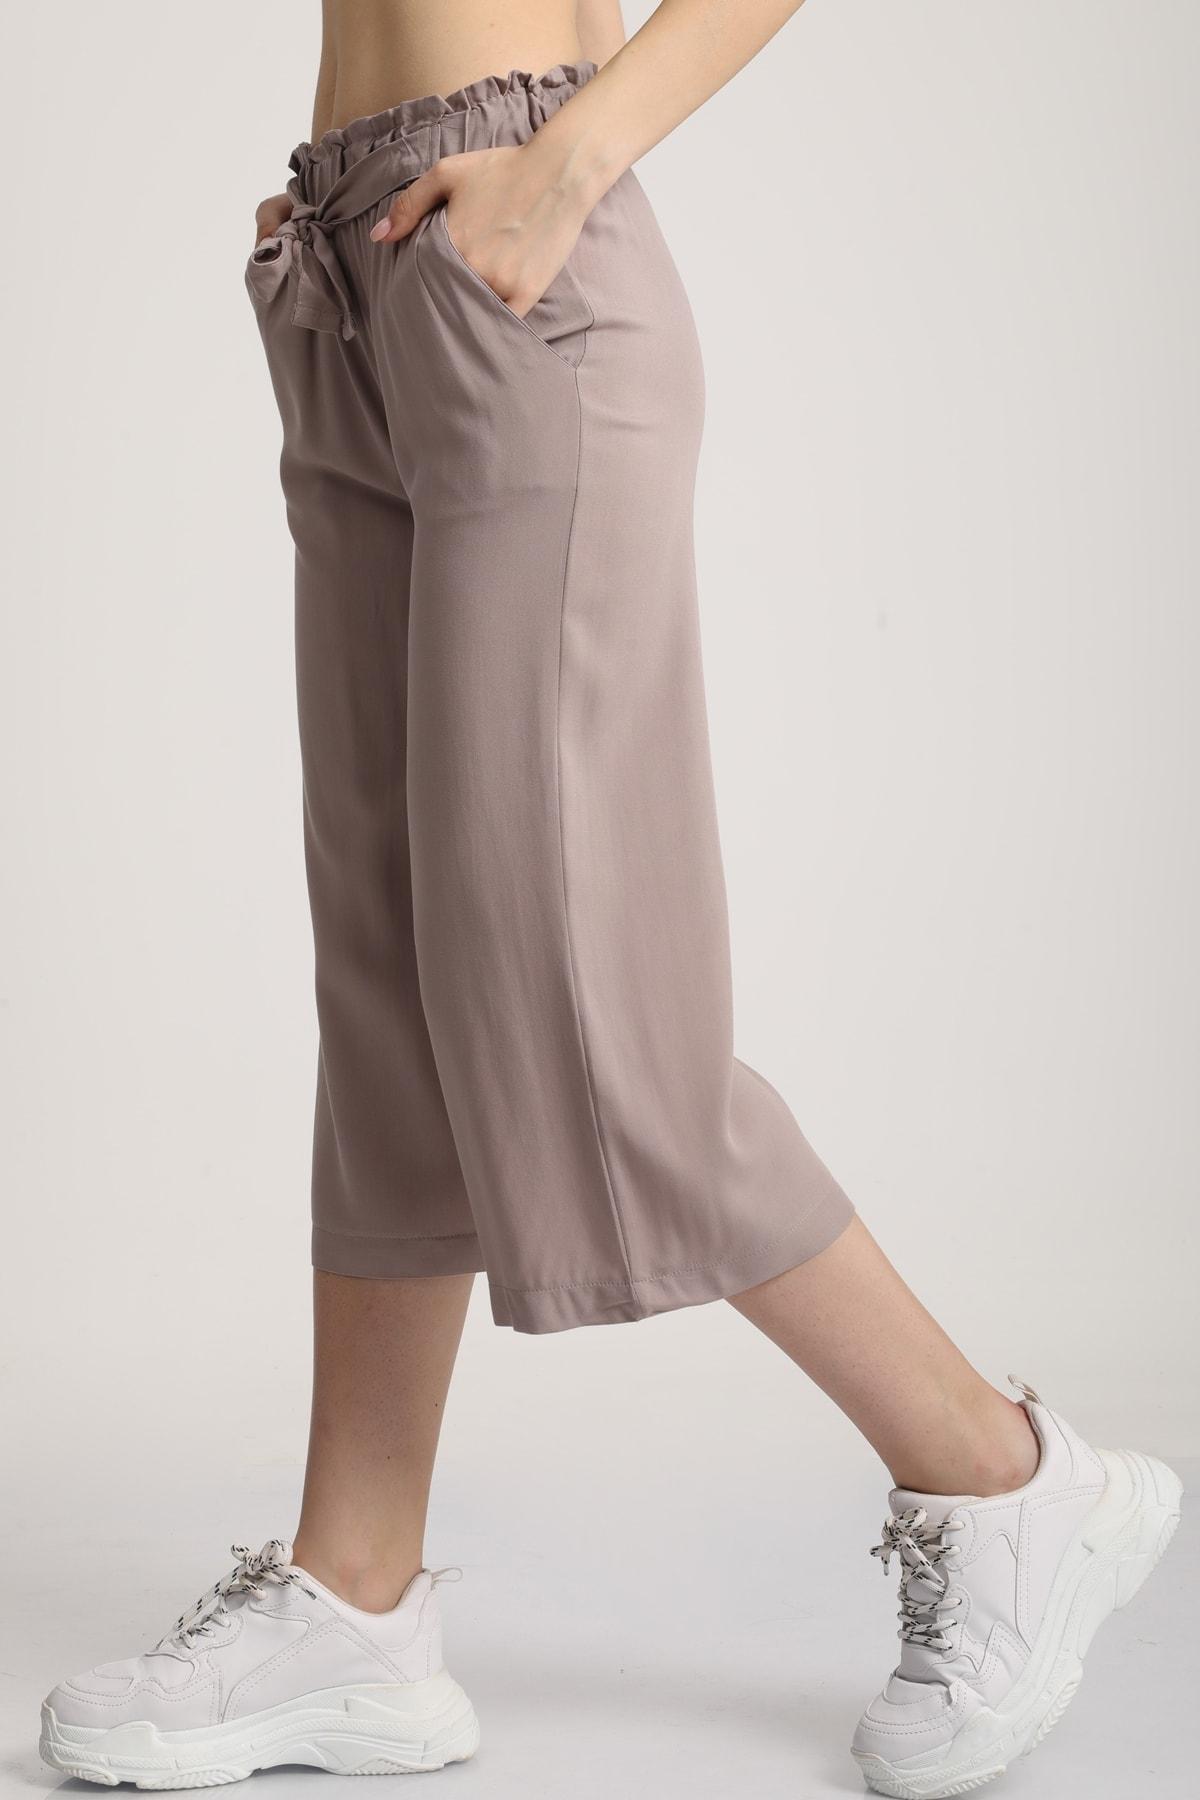 MD trend Kadın Taş Bel Lastikli Bağlamalı Kısa Pantolon Mdt5979 2